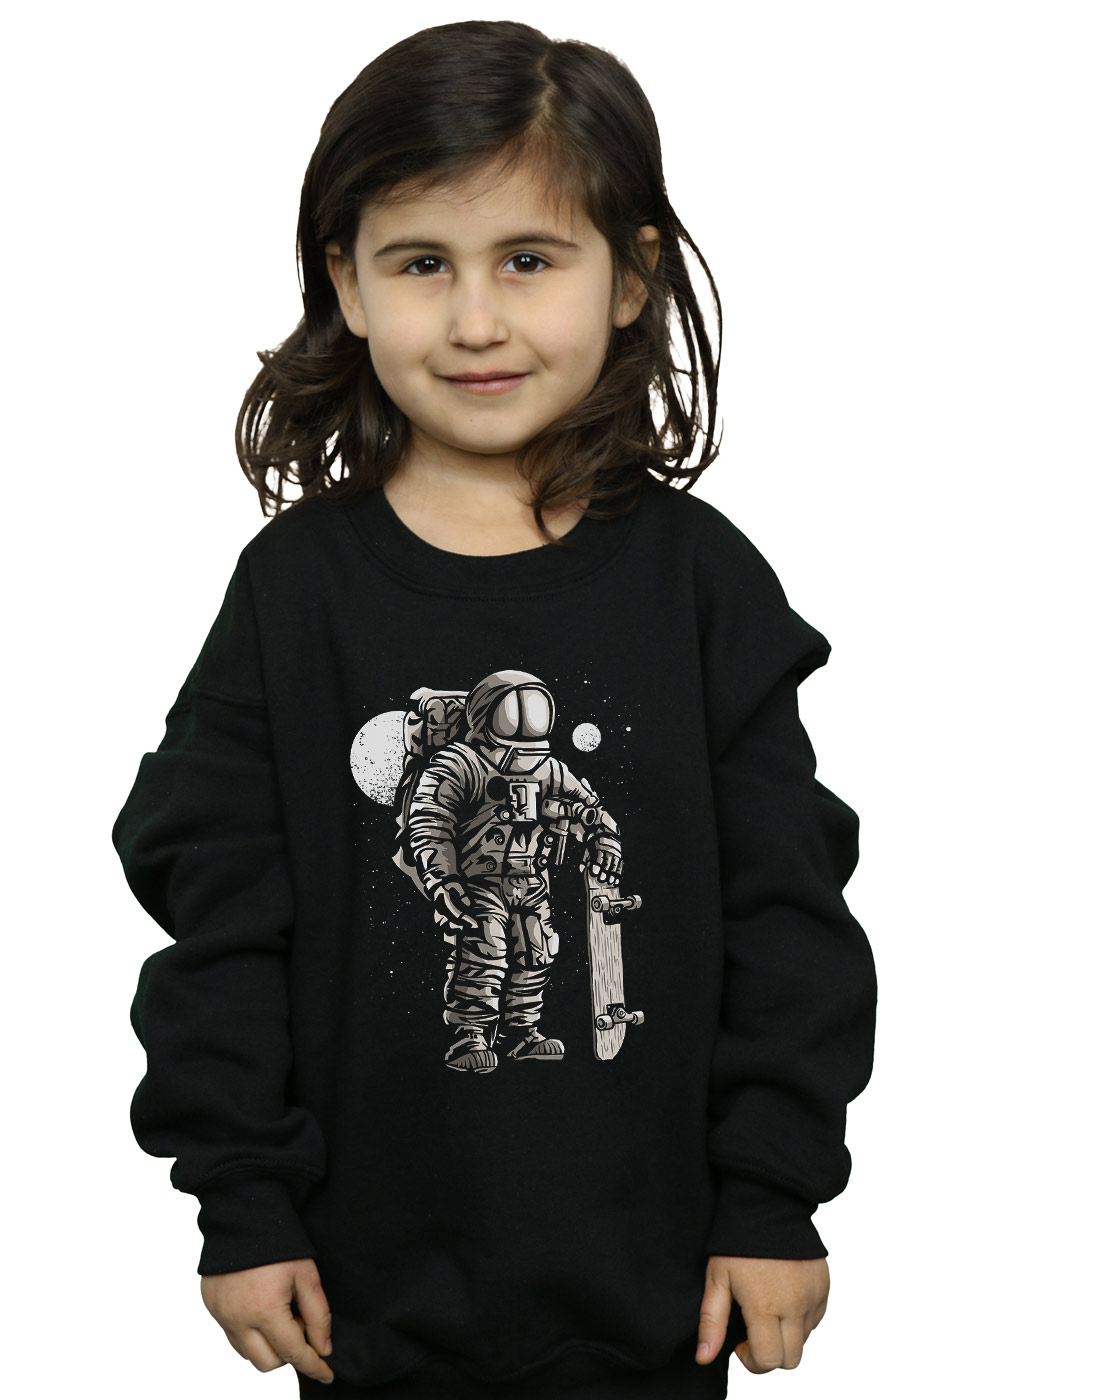 ABSOLUTECULT Drewbacca Girls Phone Kid Sweatshirt